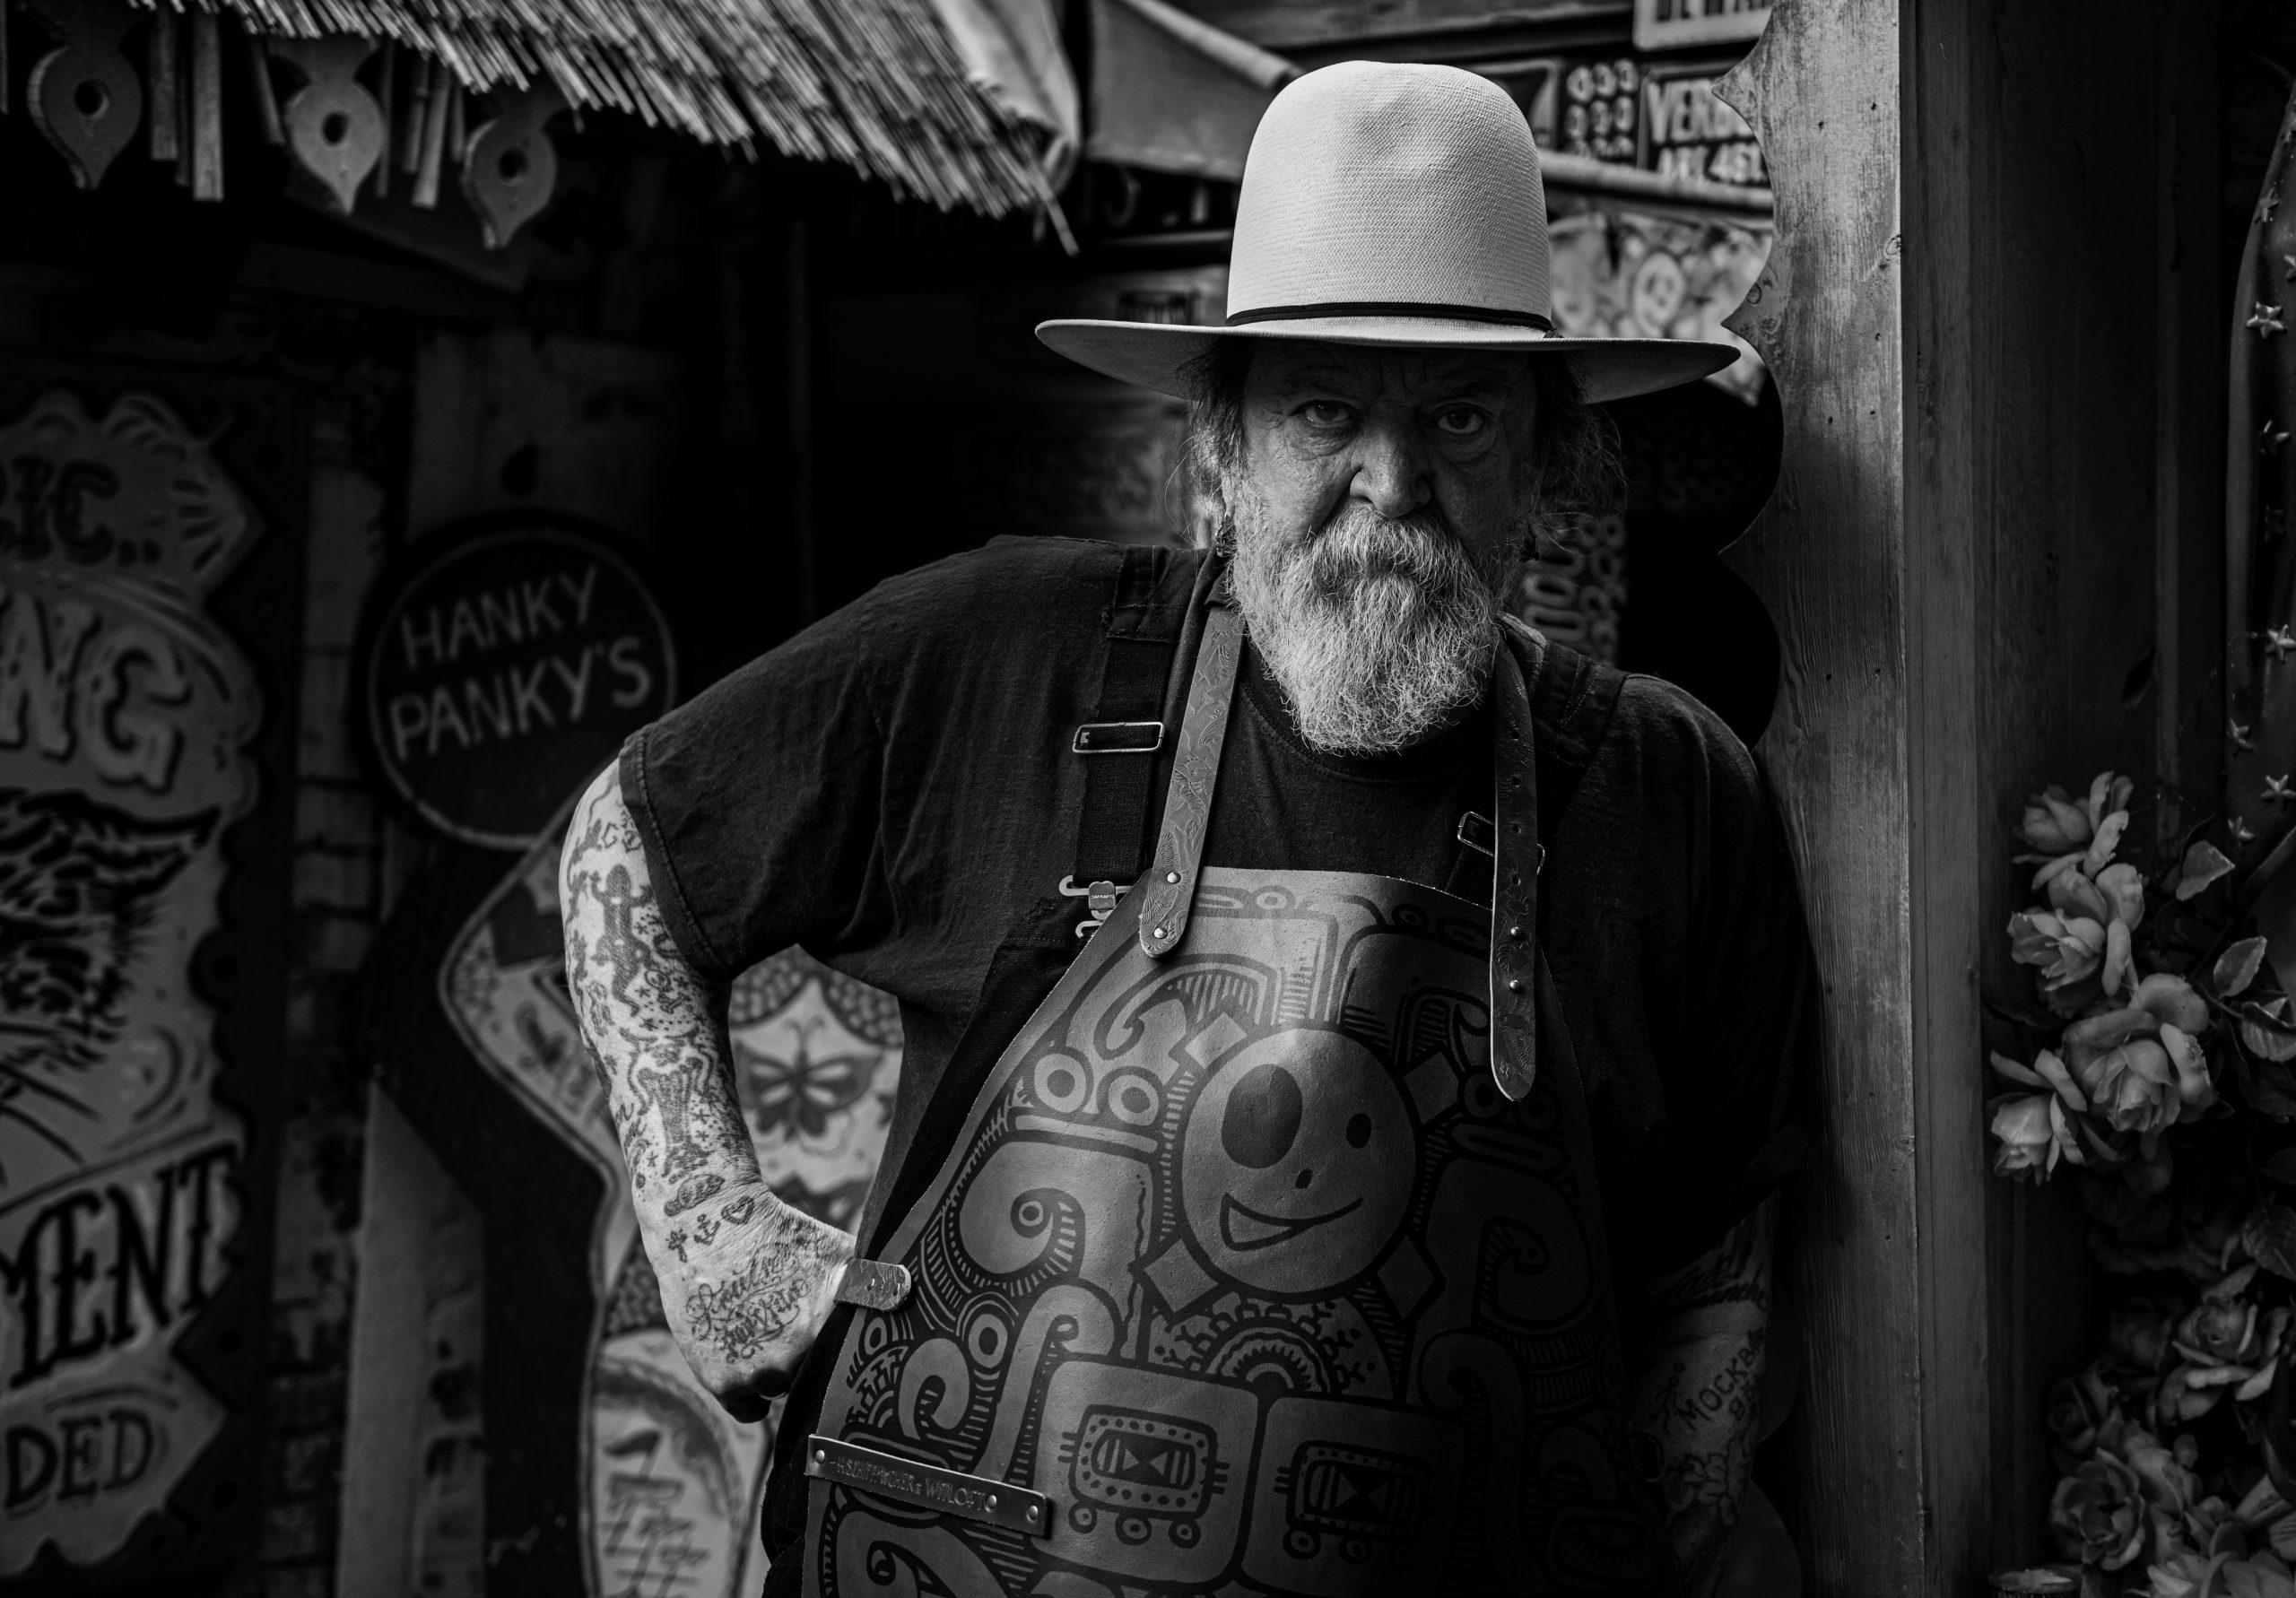 shiffmacher tattooed apron